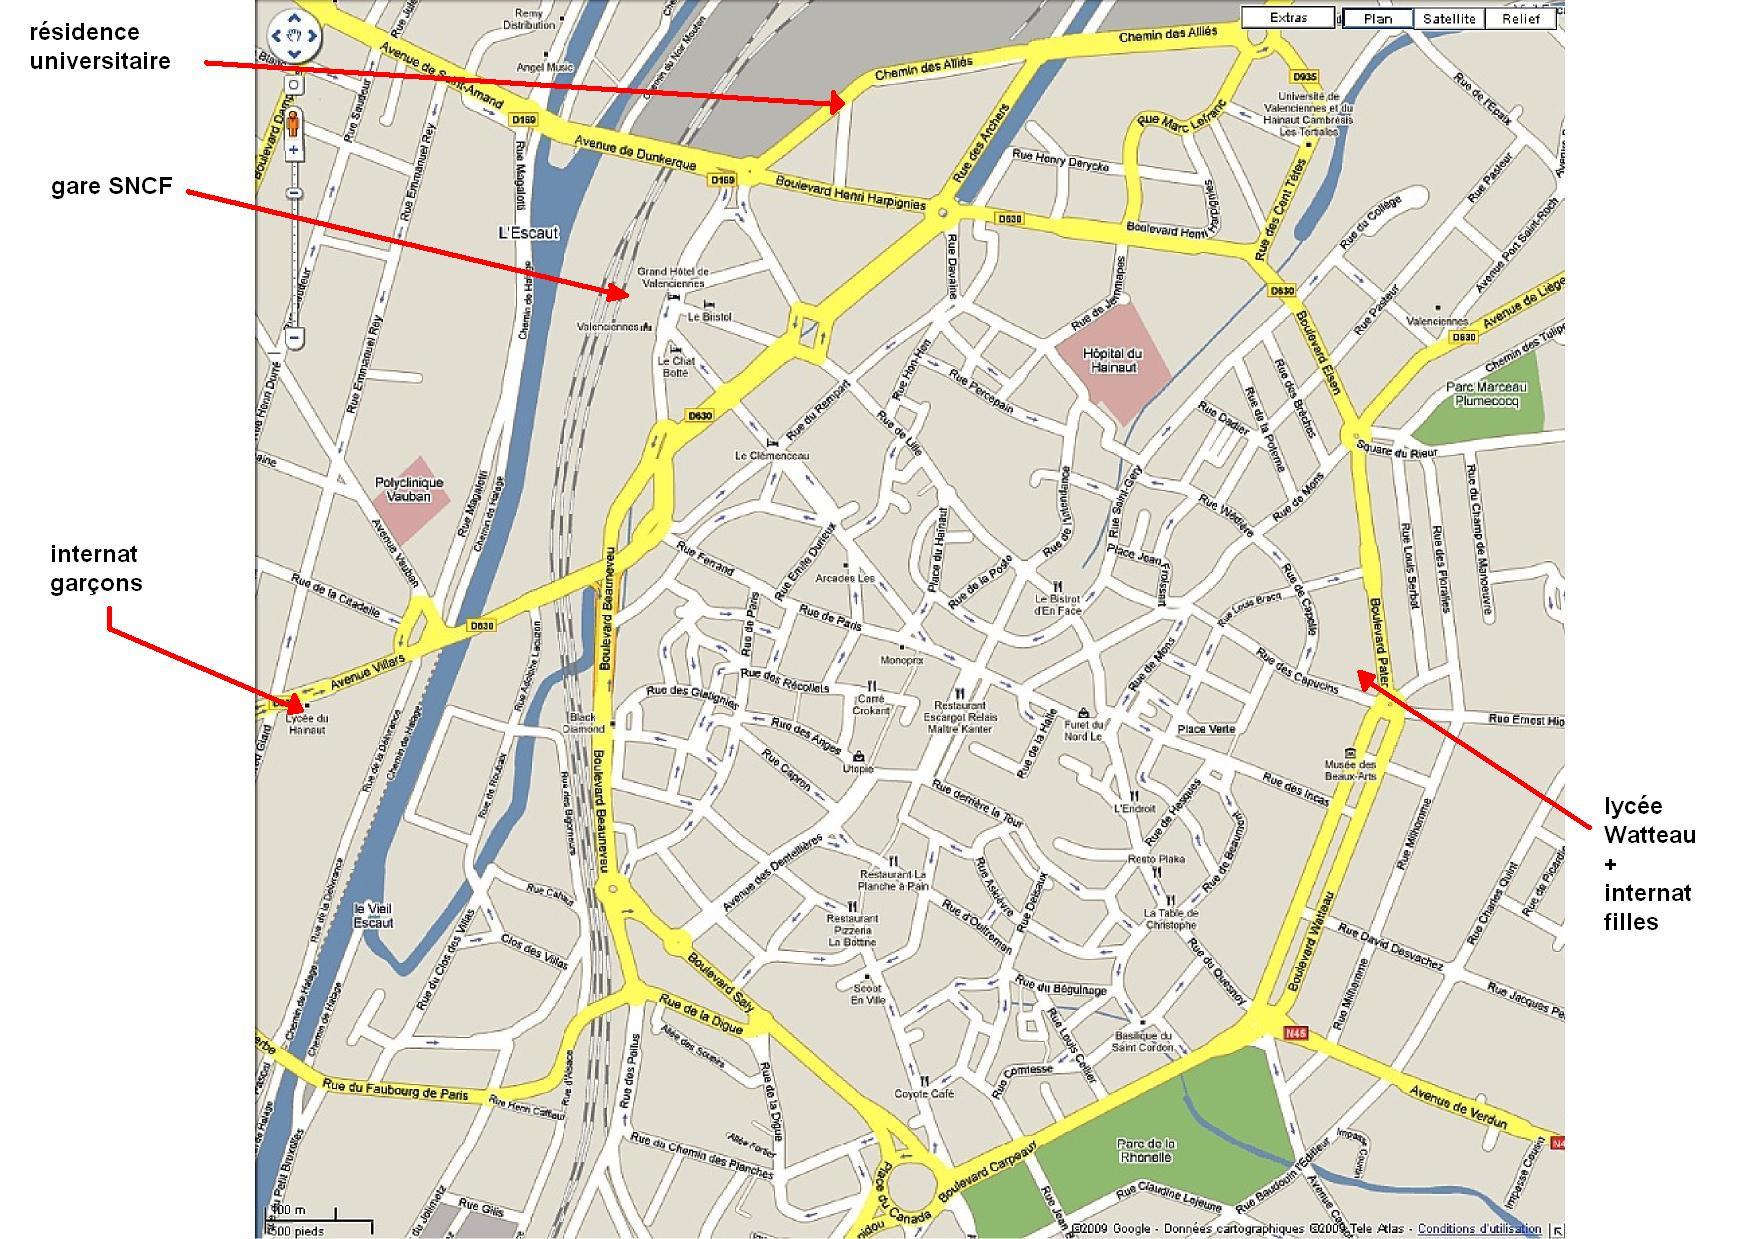 plan du cul Valenciennes